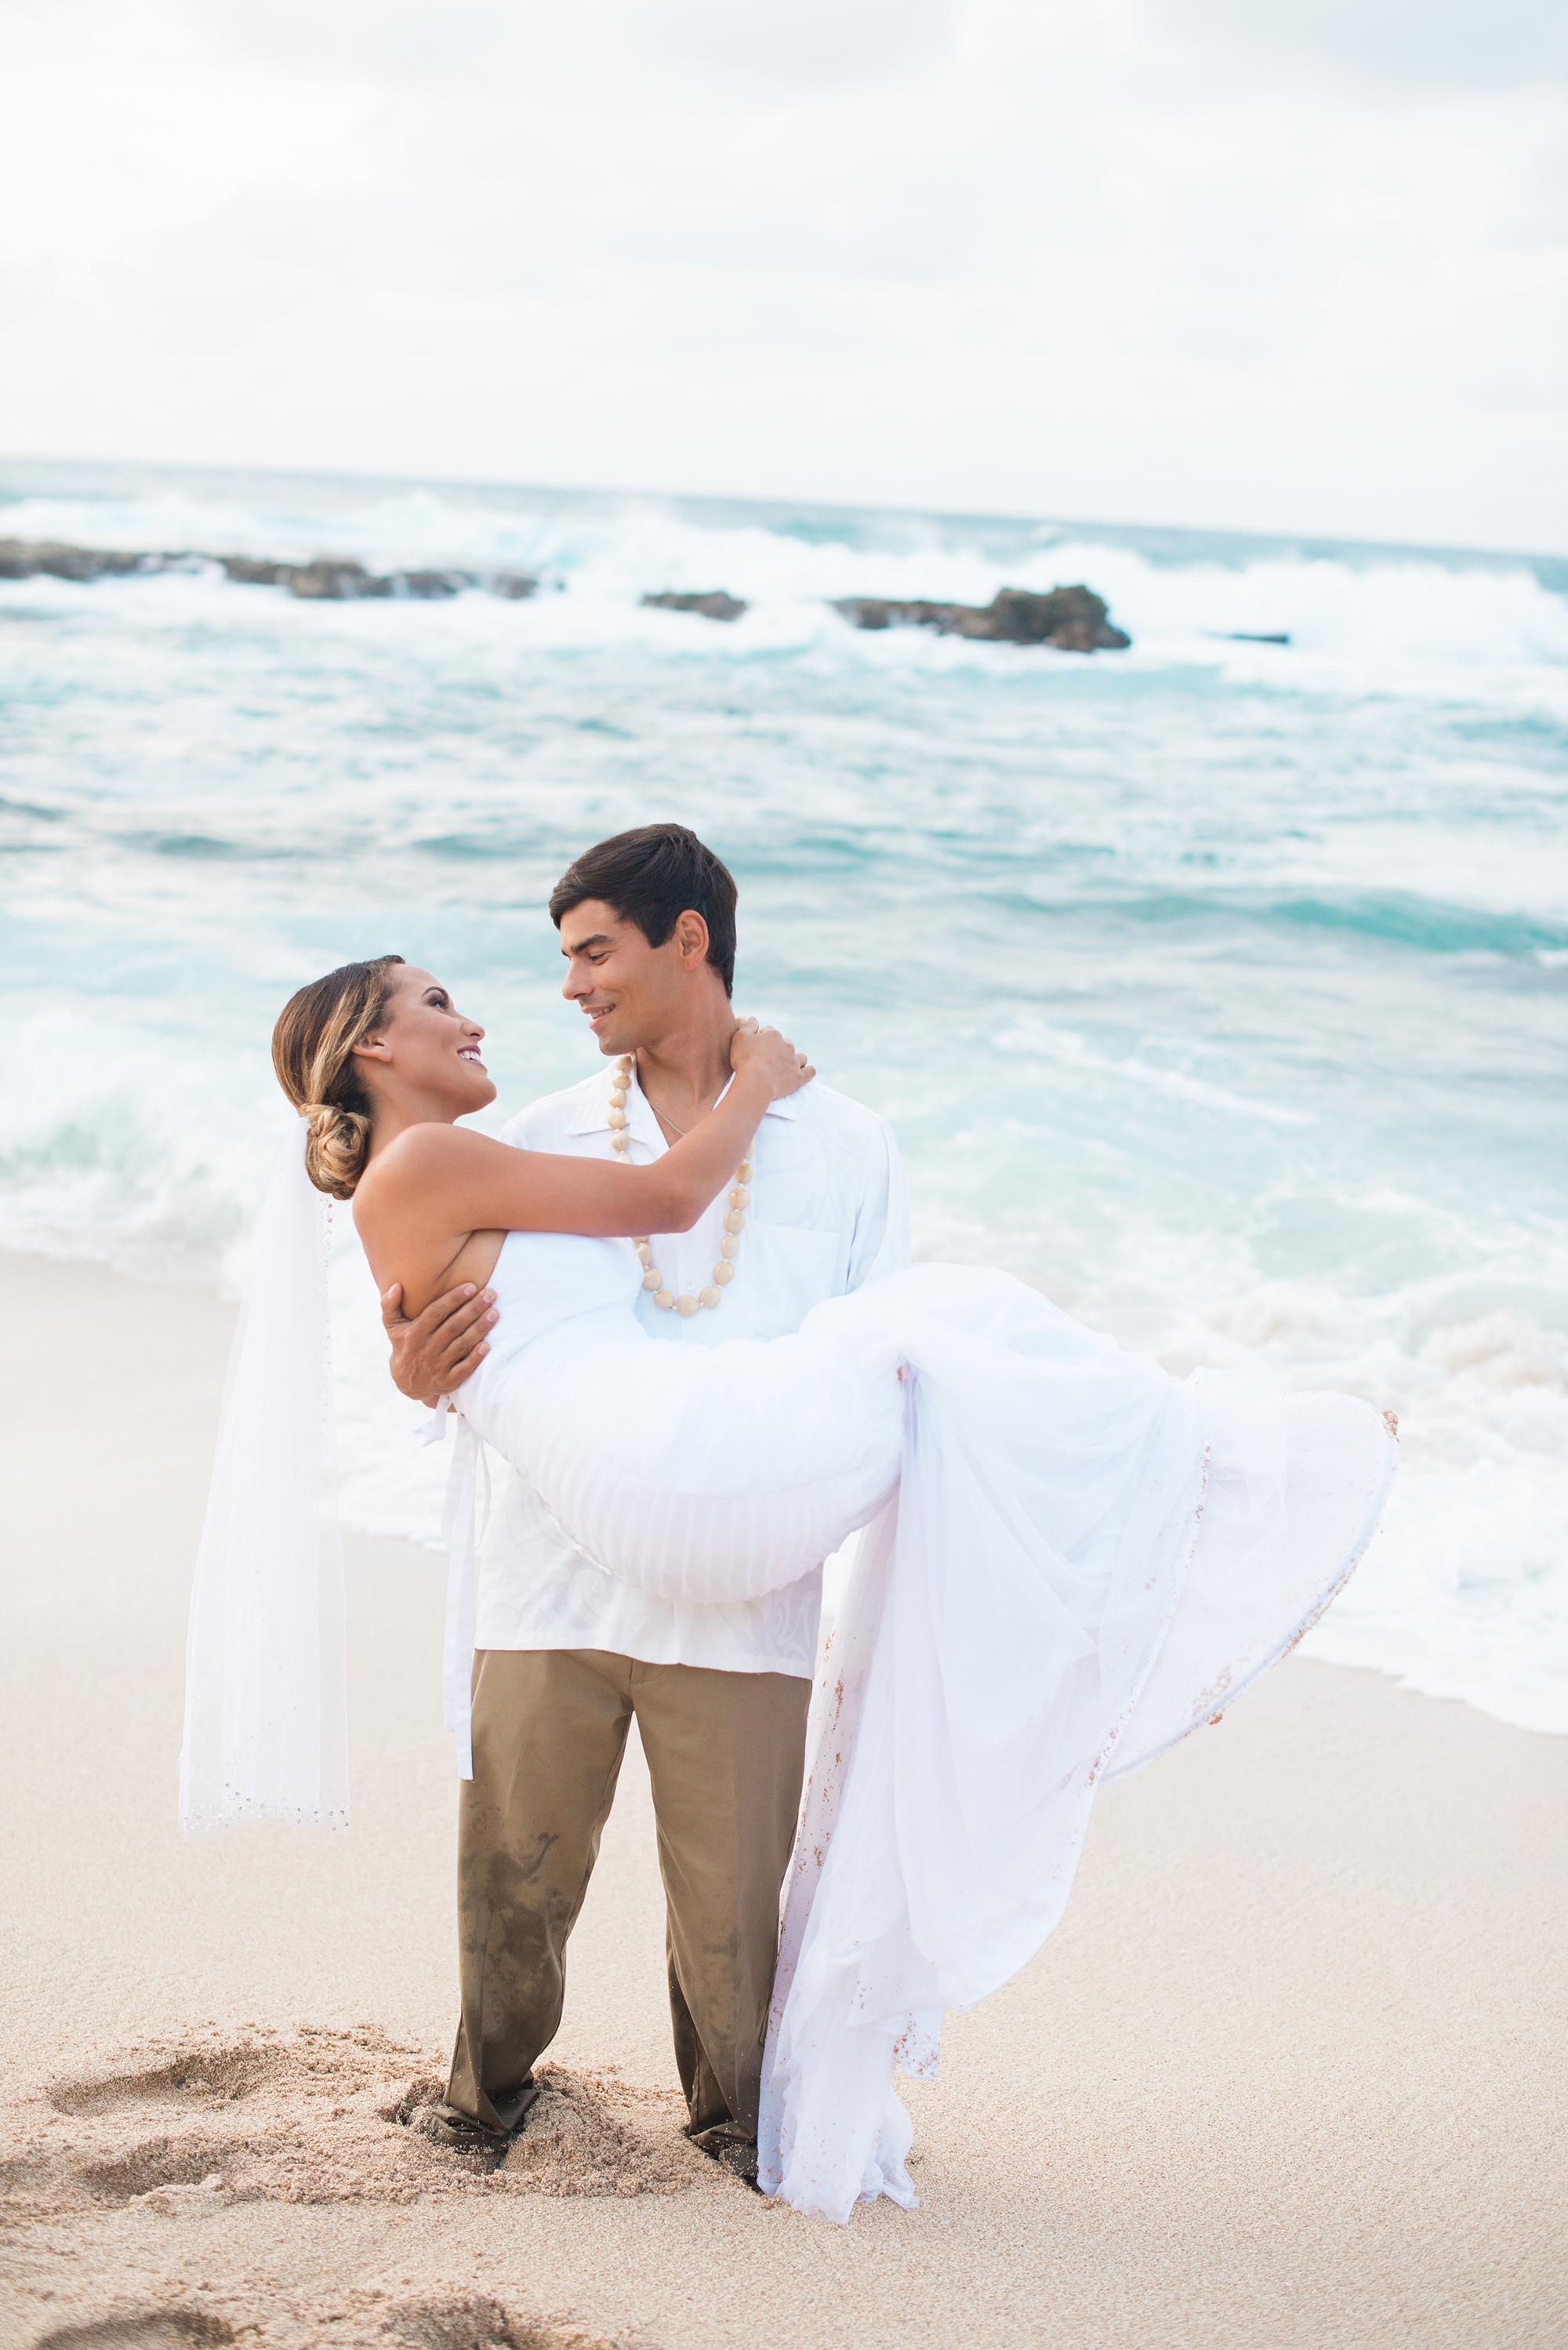 Hawaiian-Elopement-Marianne-Blackham-Photography-couple-sand.jpg